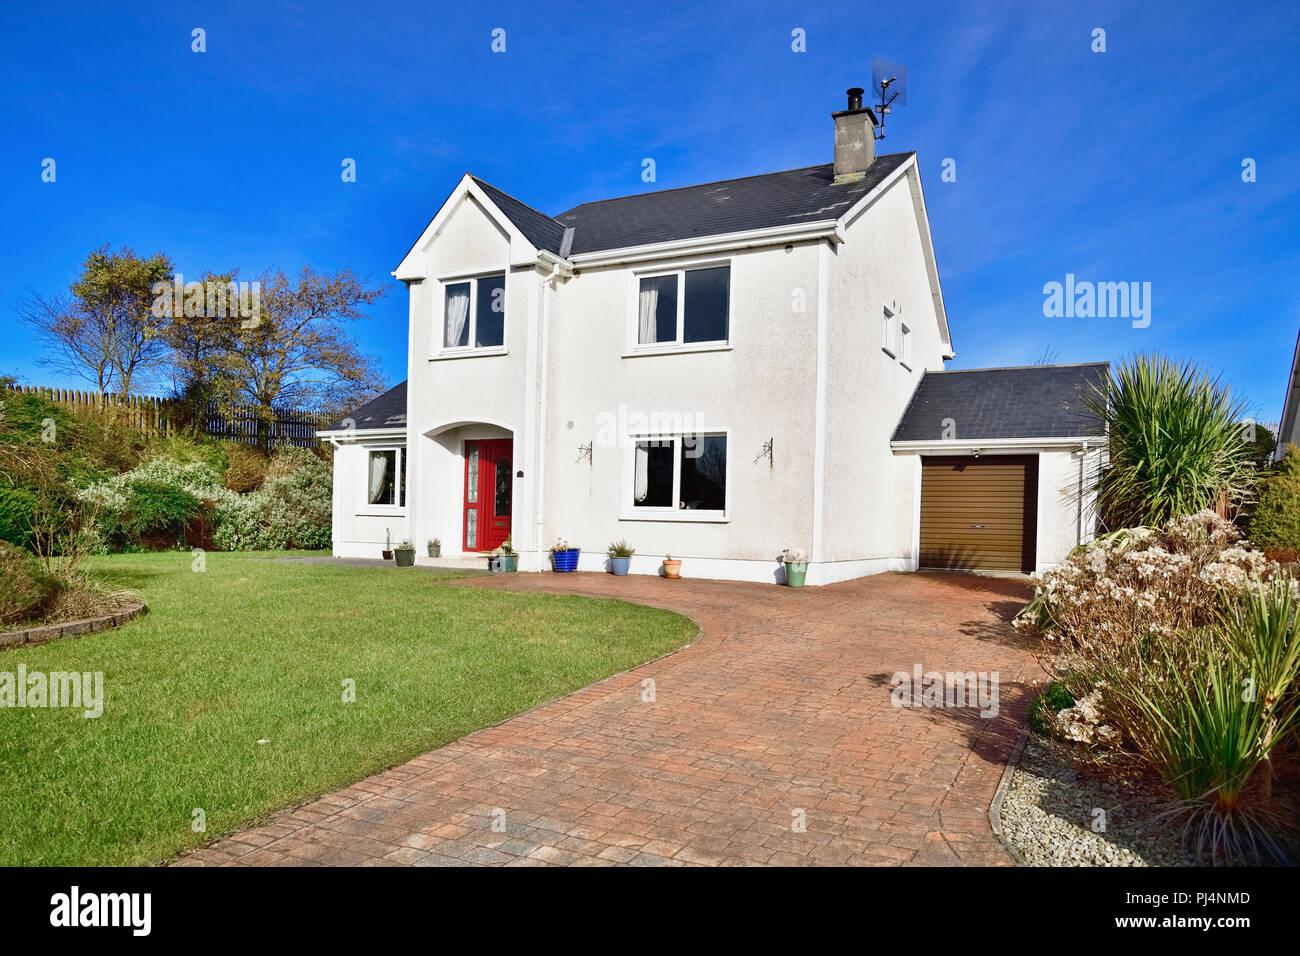 Ireland, County Sligo, Carney, suburban detached house with green lawn. - Stock Image